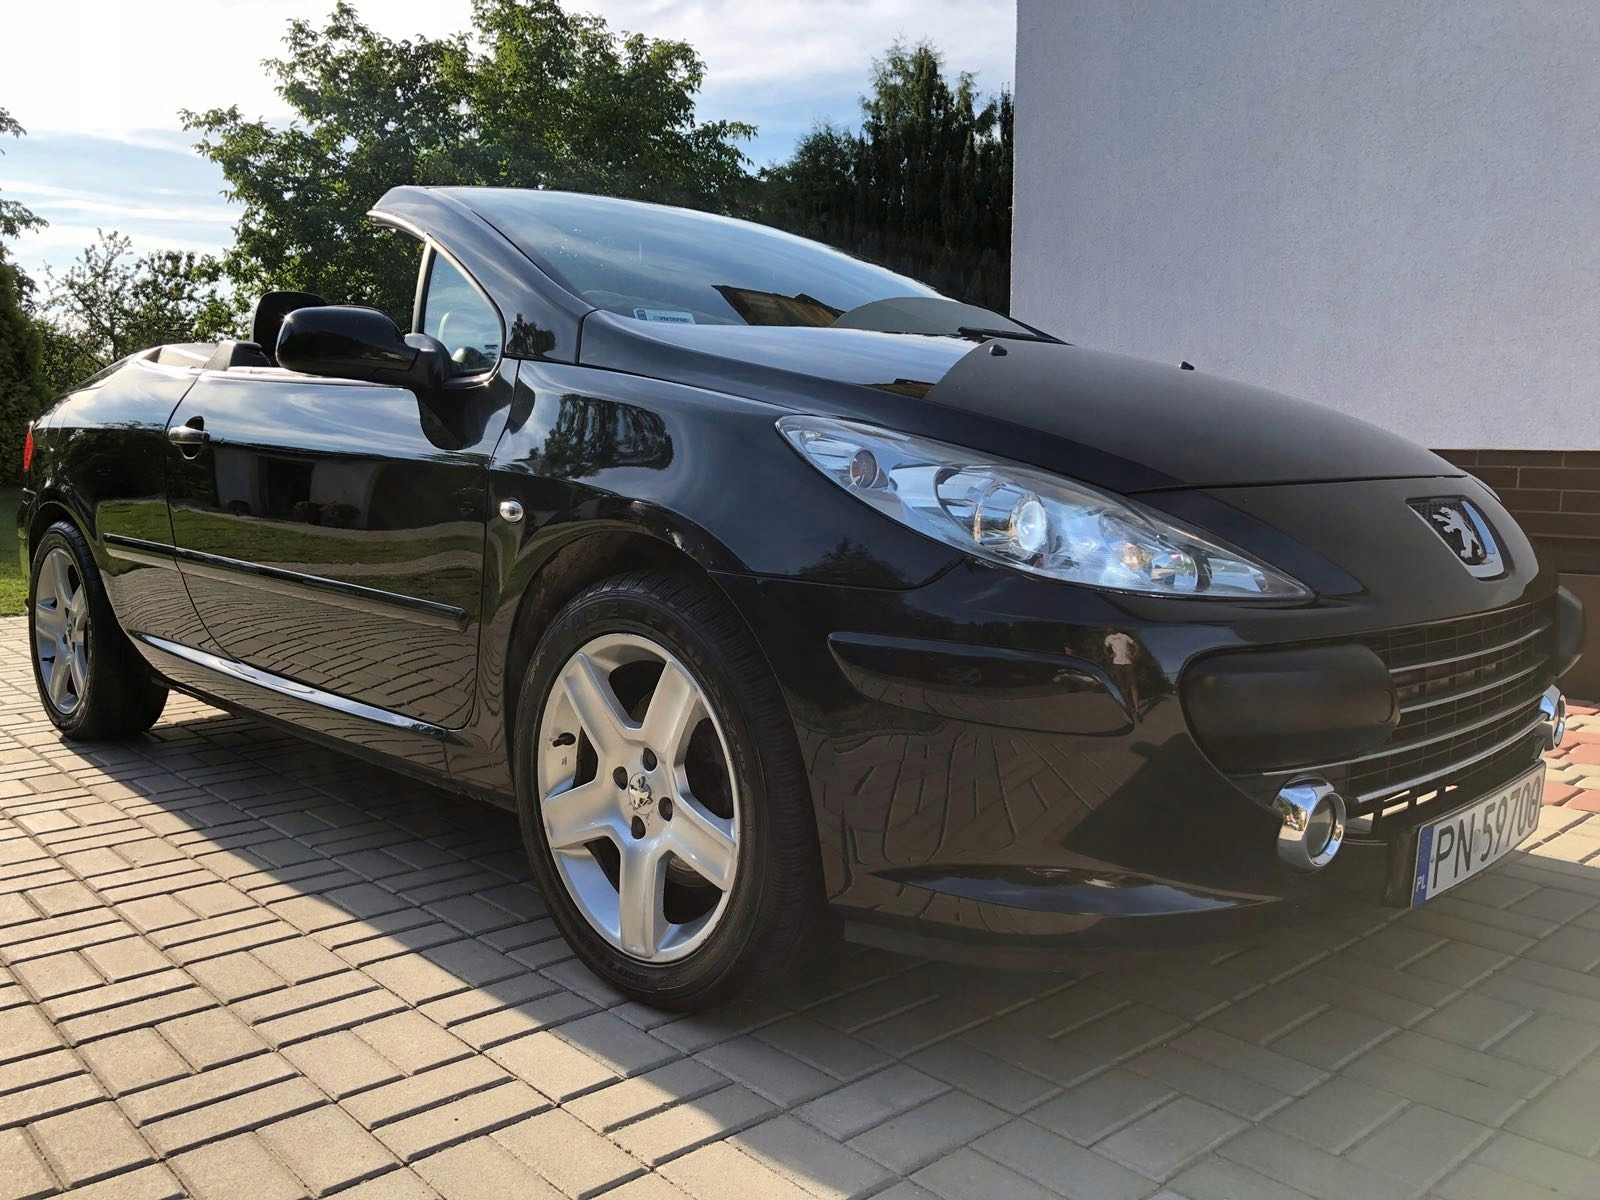 Peugeot 307cc 2.0 HDI 136KM 185tys ZADBANY !